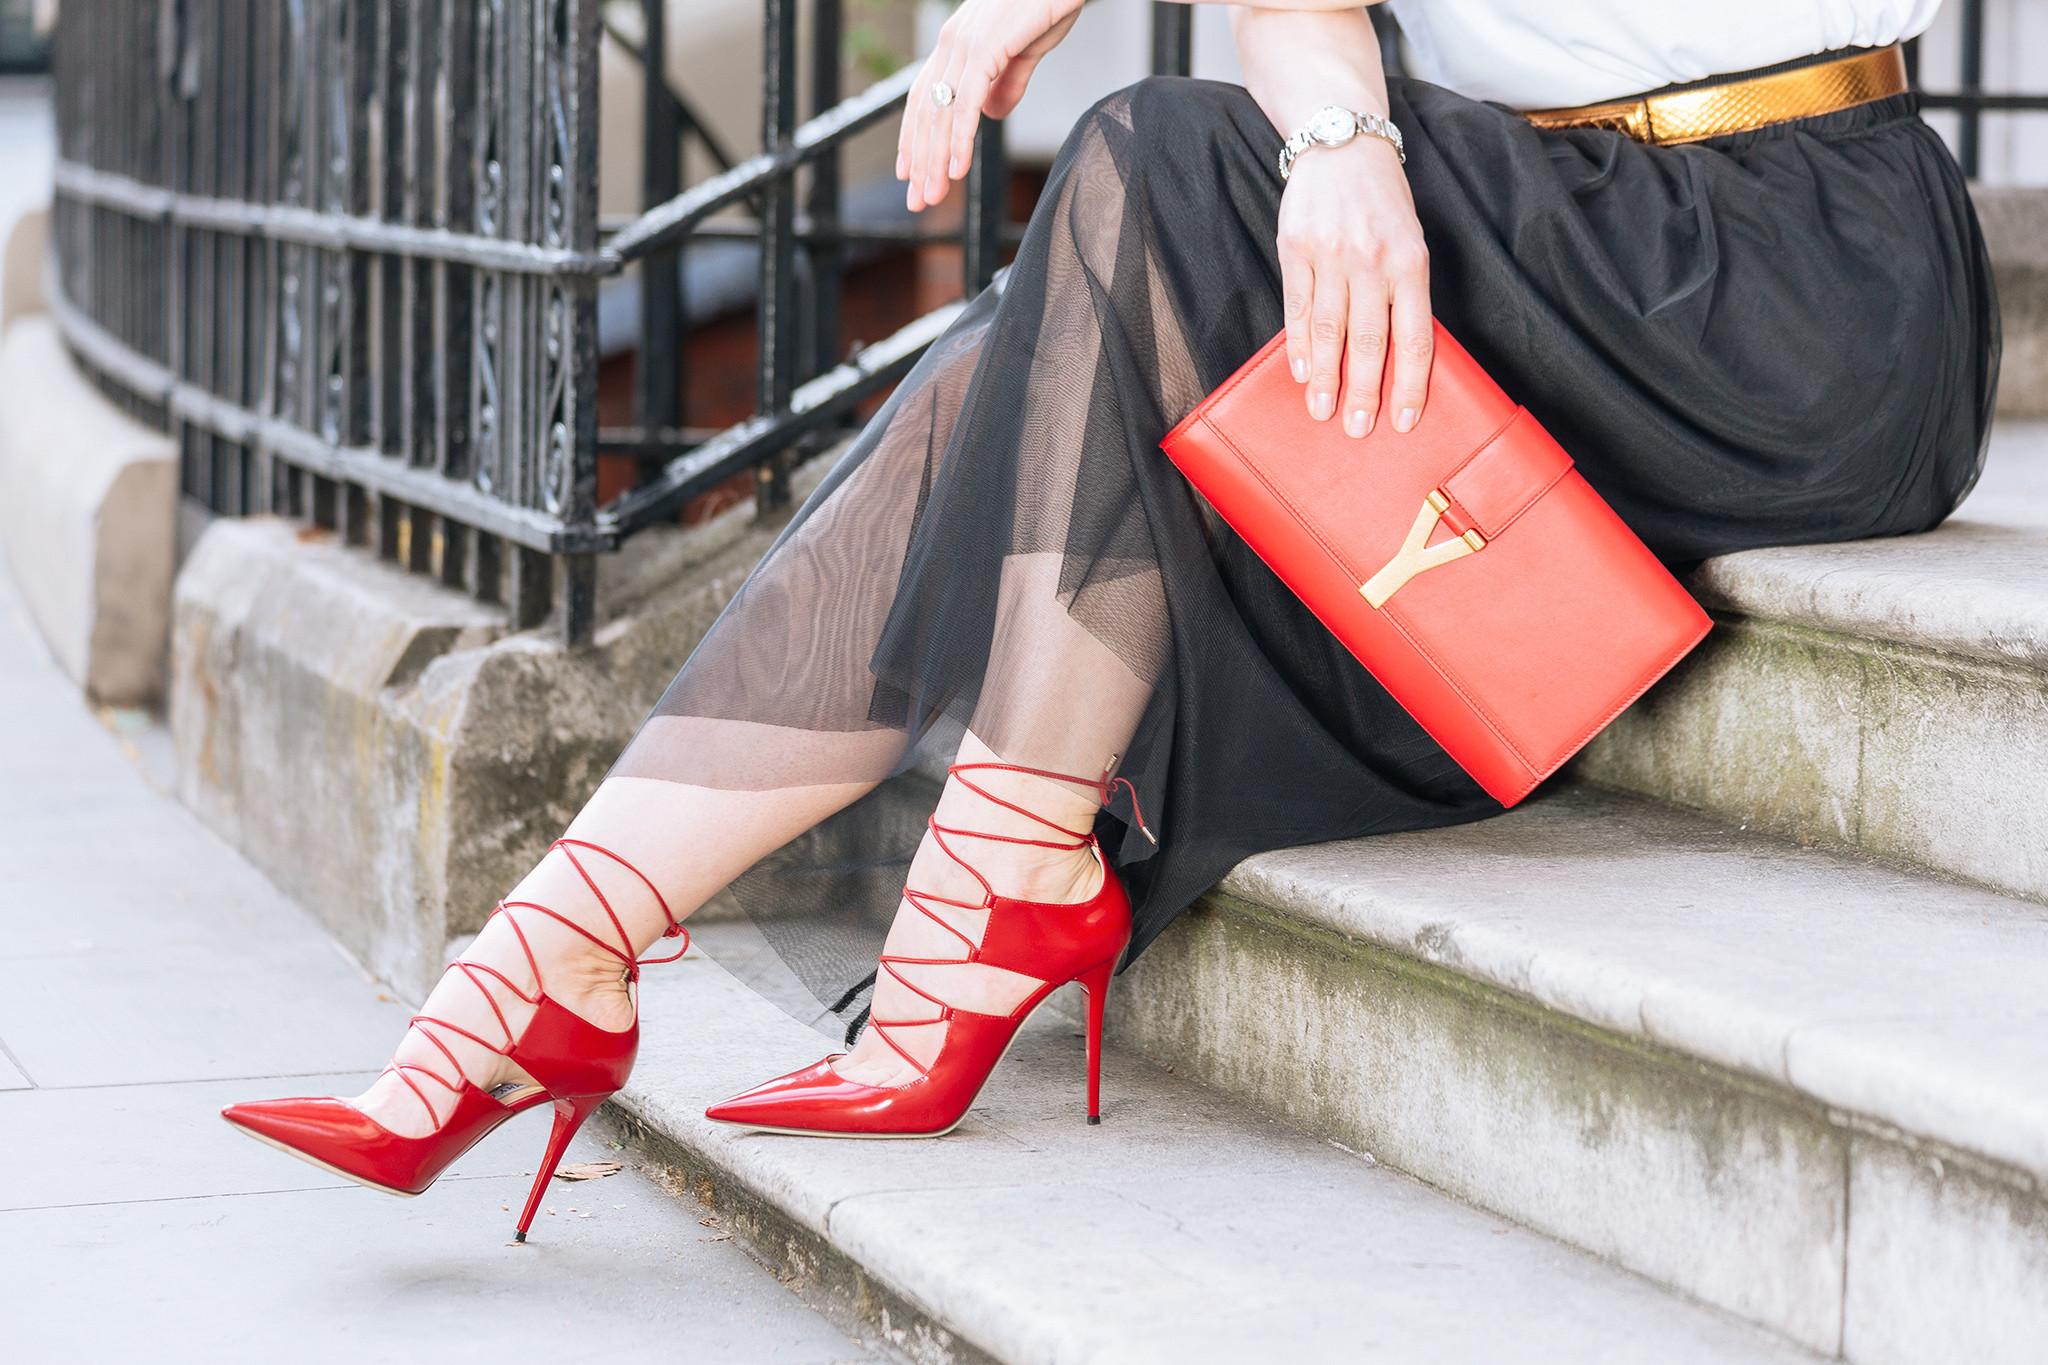 Jimmy Choo red shoes, long black tulle skirt